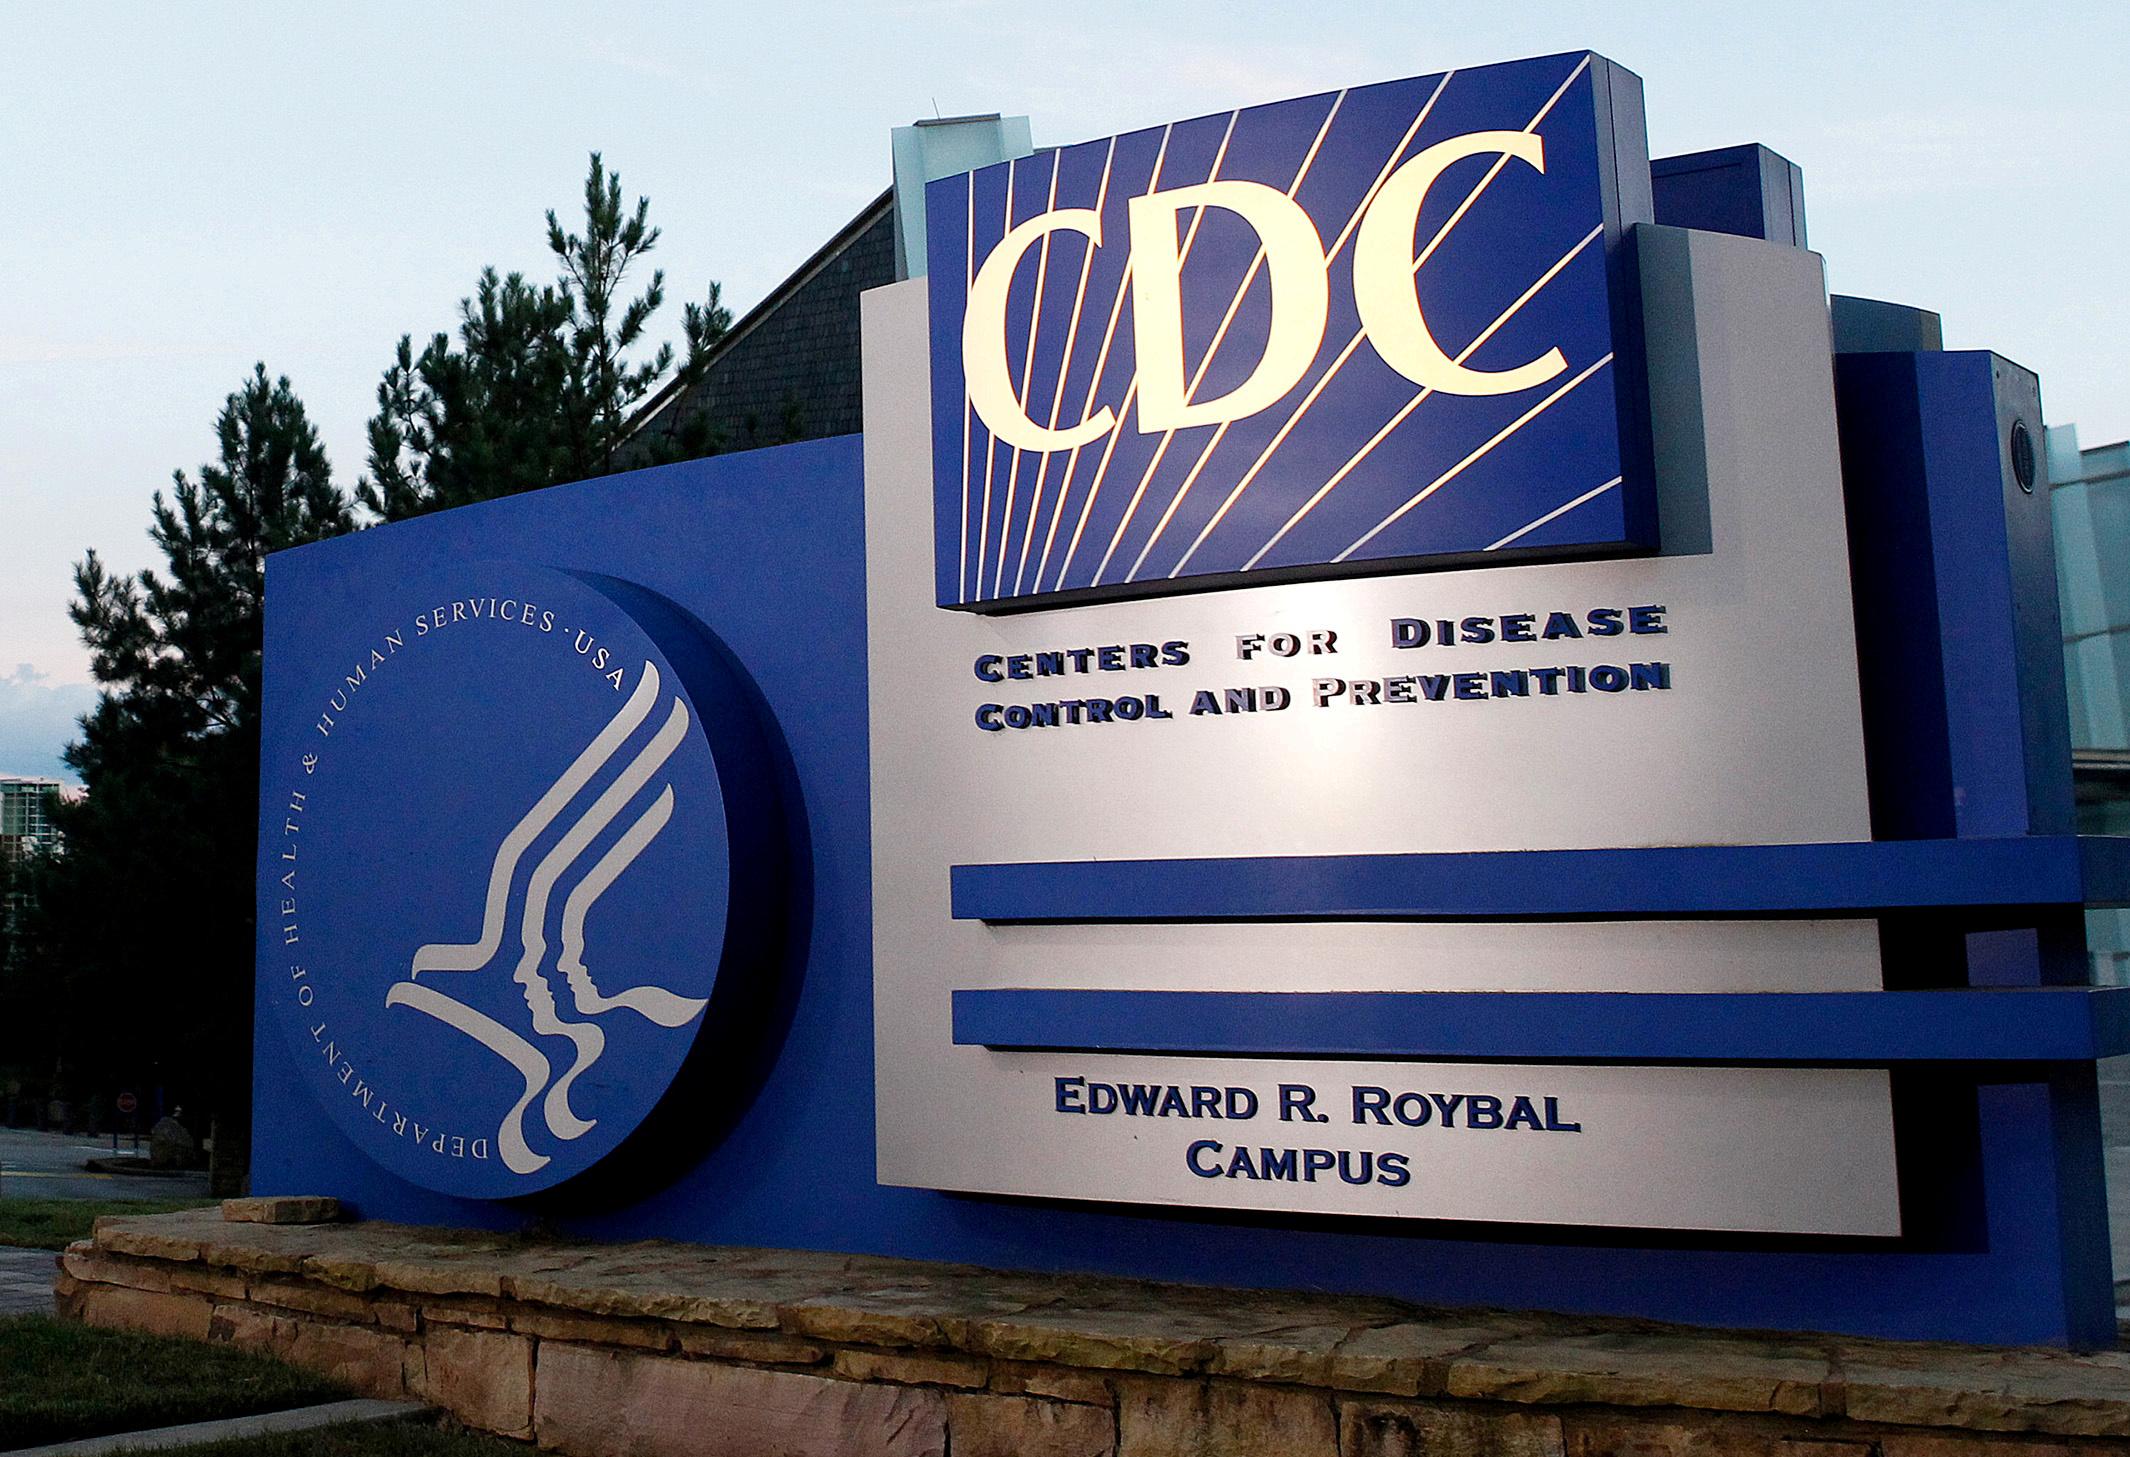 CDC突然改口風,全數刪除有關透過空氣傳播的防疫更新指引,令外界對新冠病毒的傳播途徑感到更混亂。    路透社